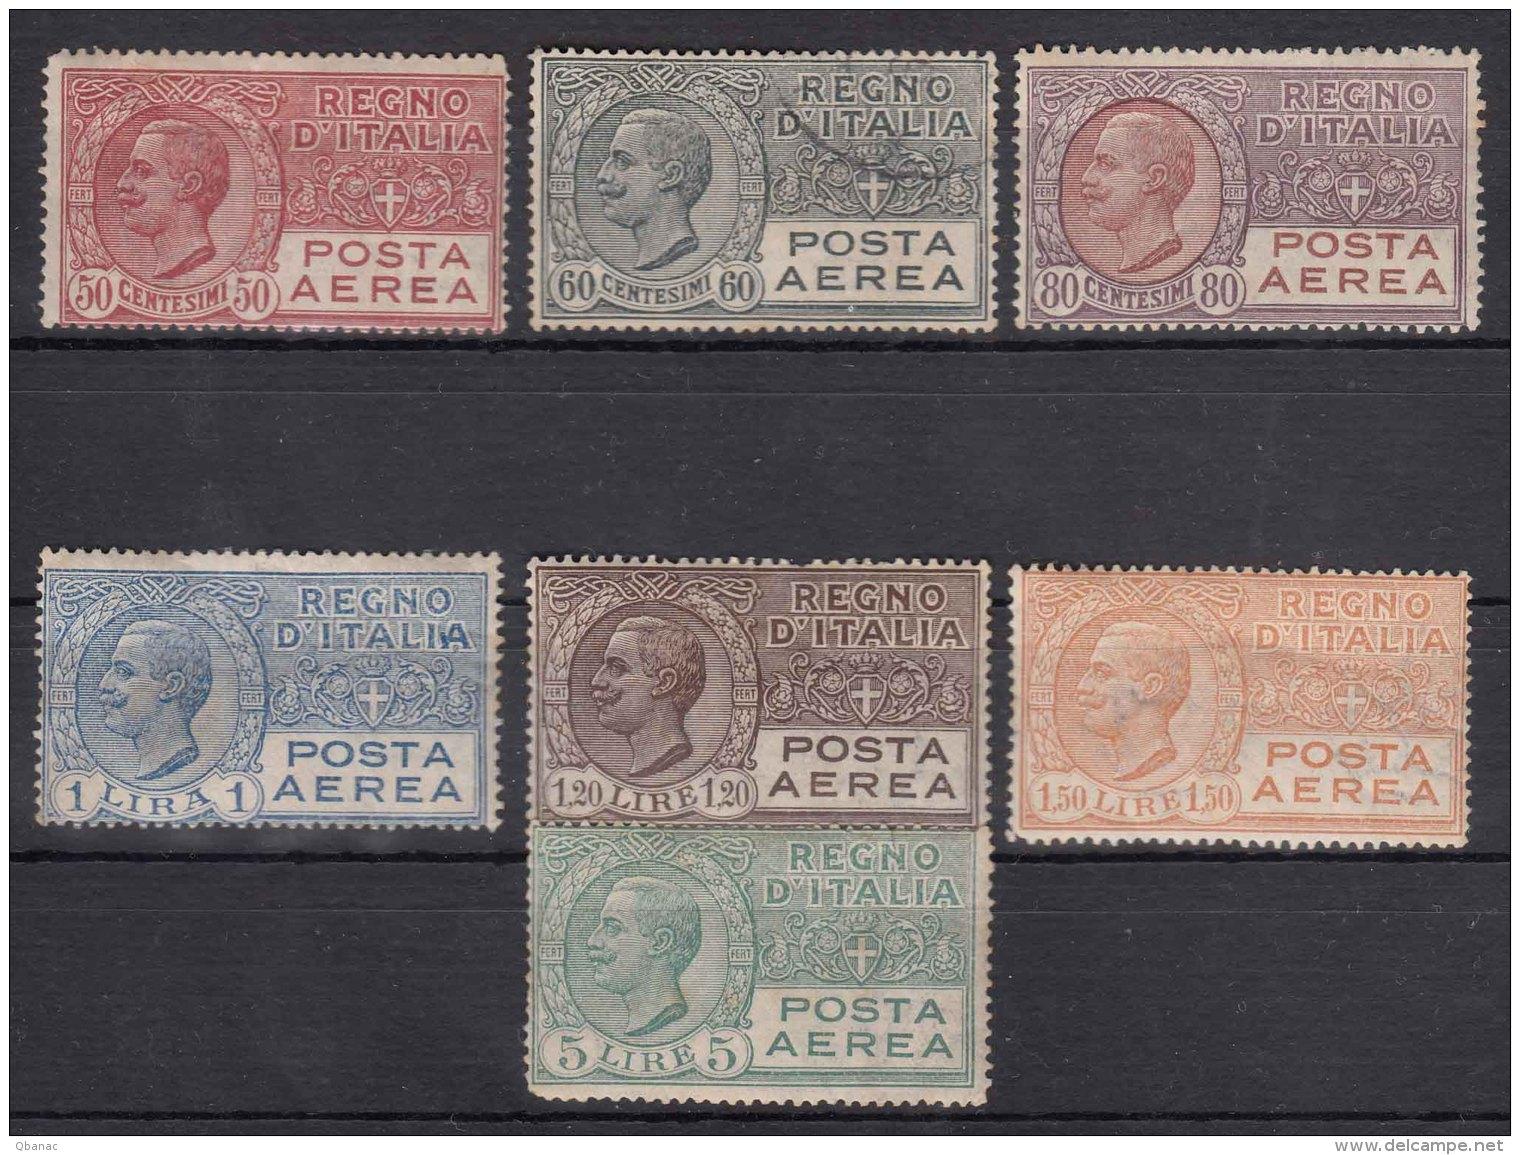 Italy 1926/1928 Posta Aerea Sassone#2A,3,3A,4,5,6,7 Mint Never Hinged (60c Used) - 1900-44 Vittorio Emanuele III